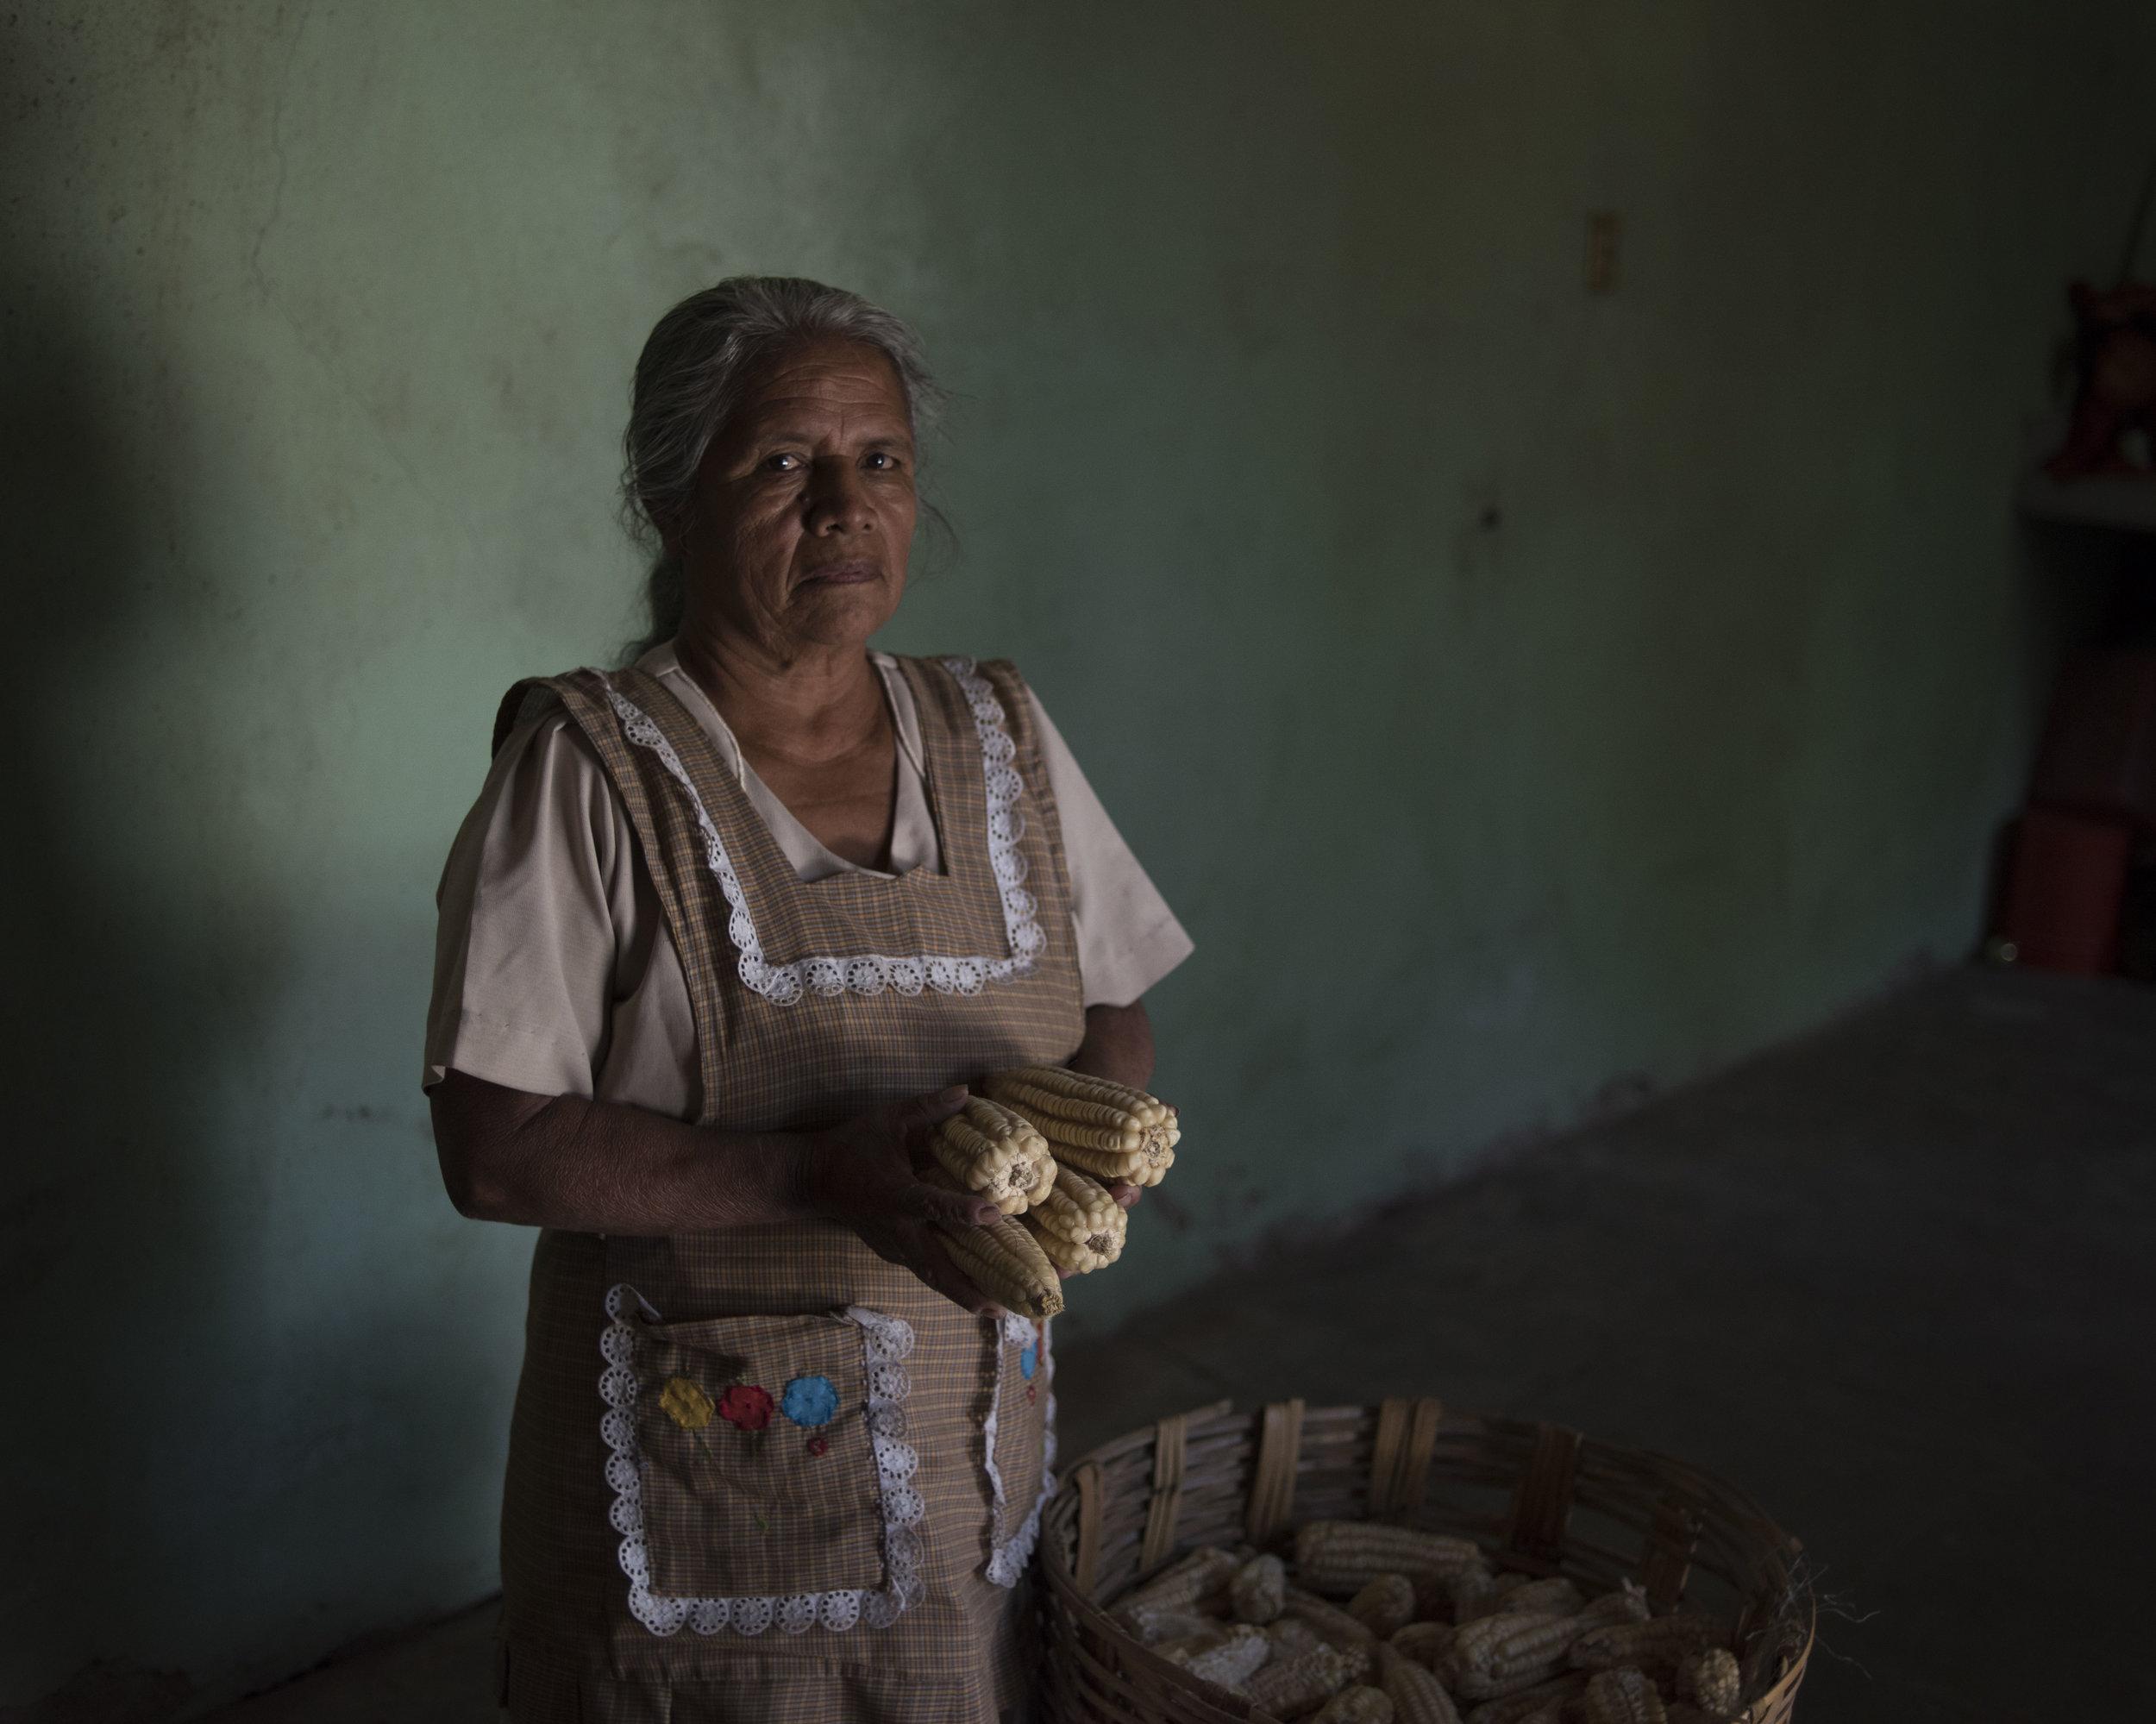 Maria Luisa Lopez, Abasolo, OAX.